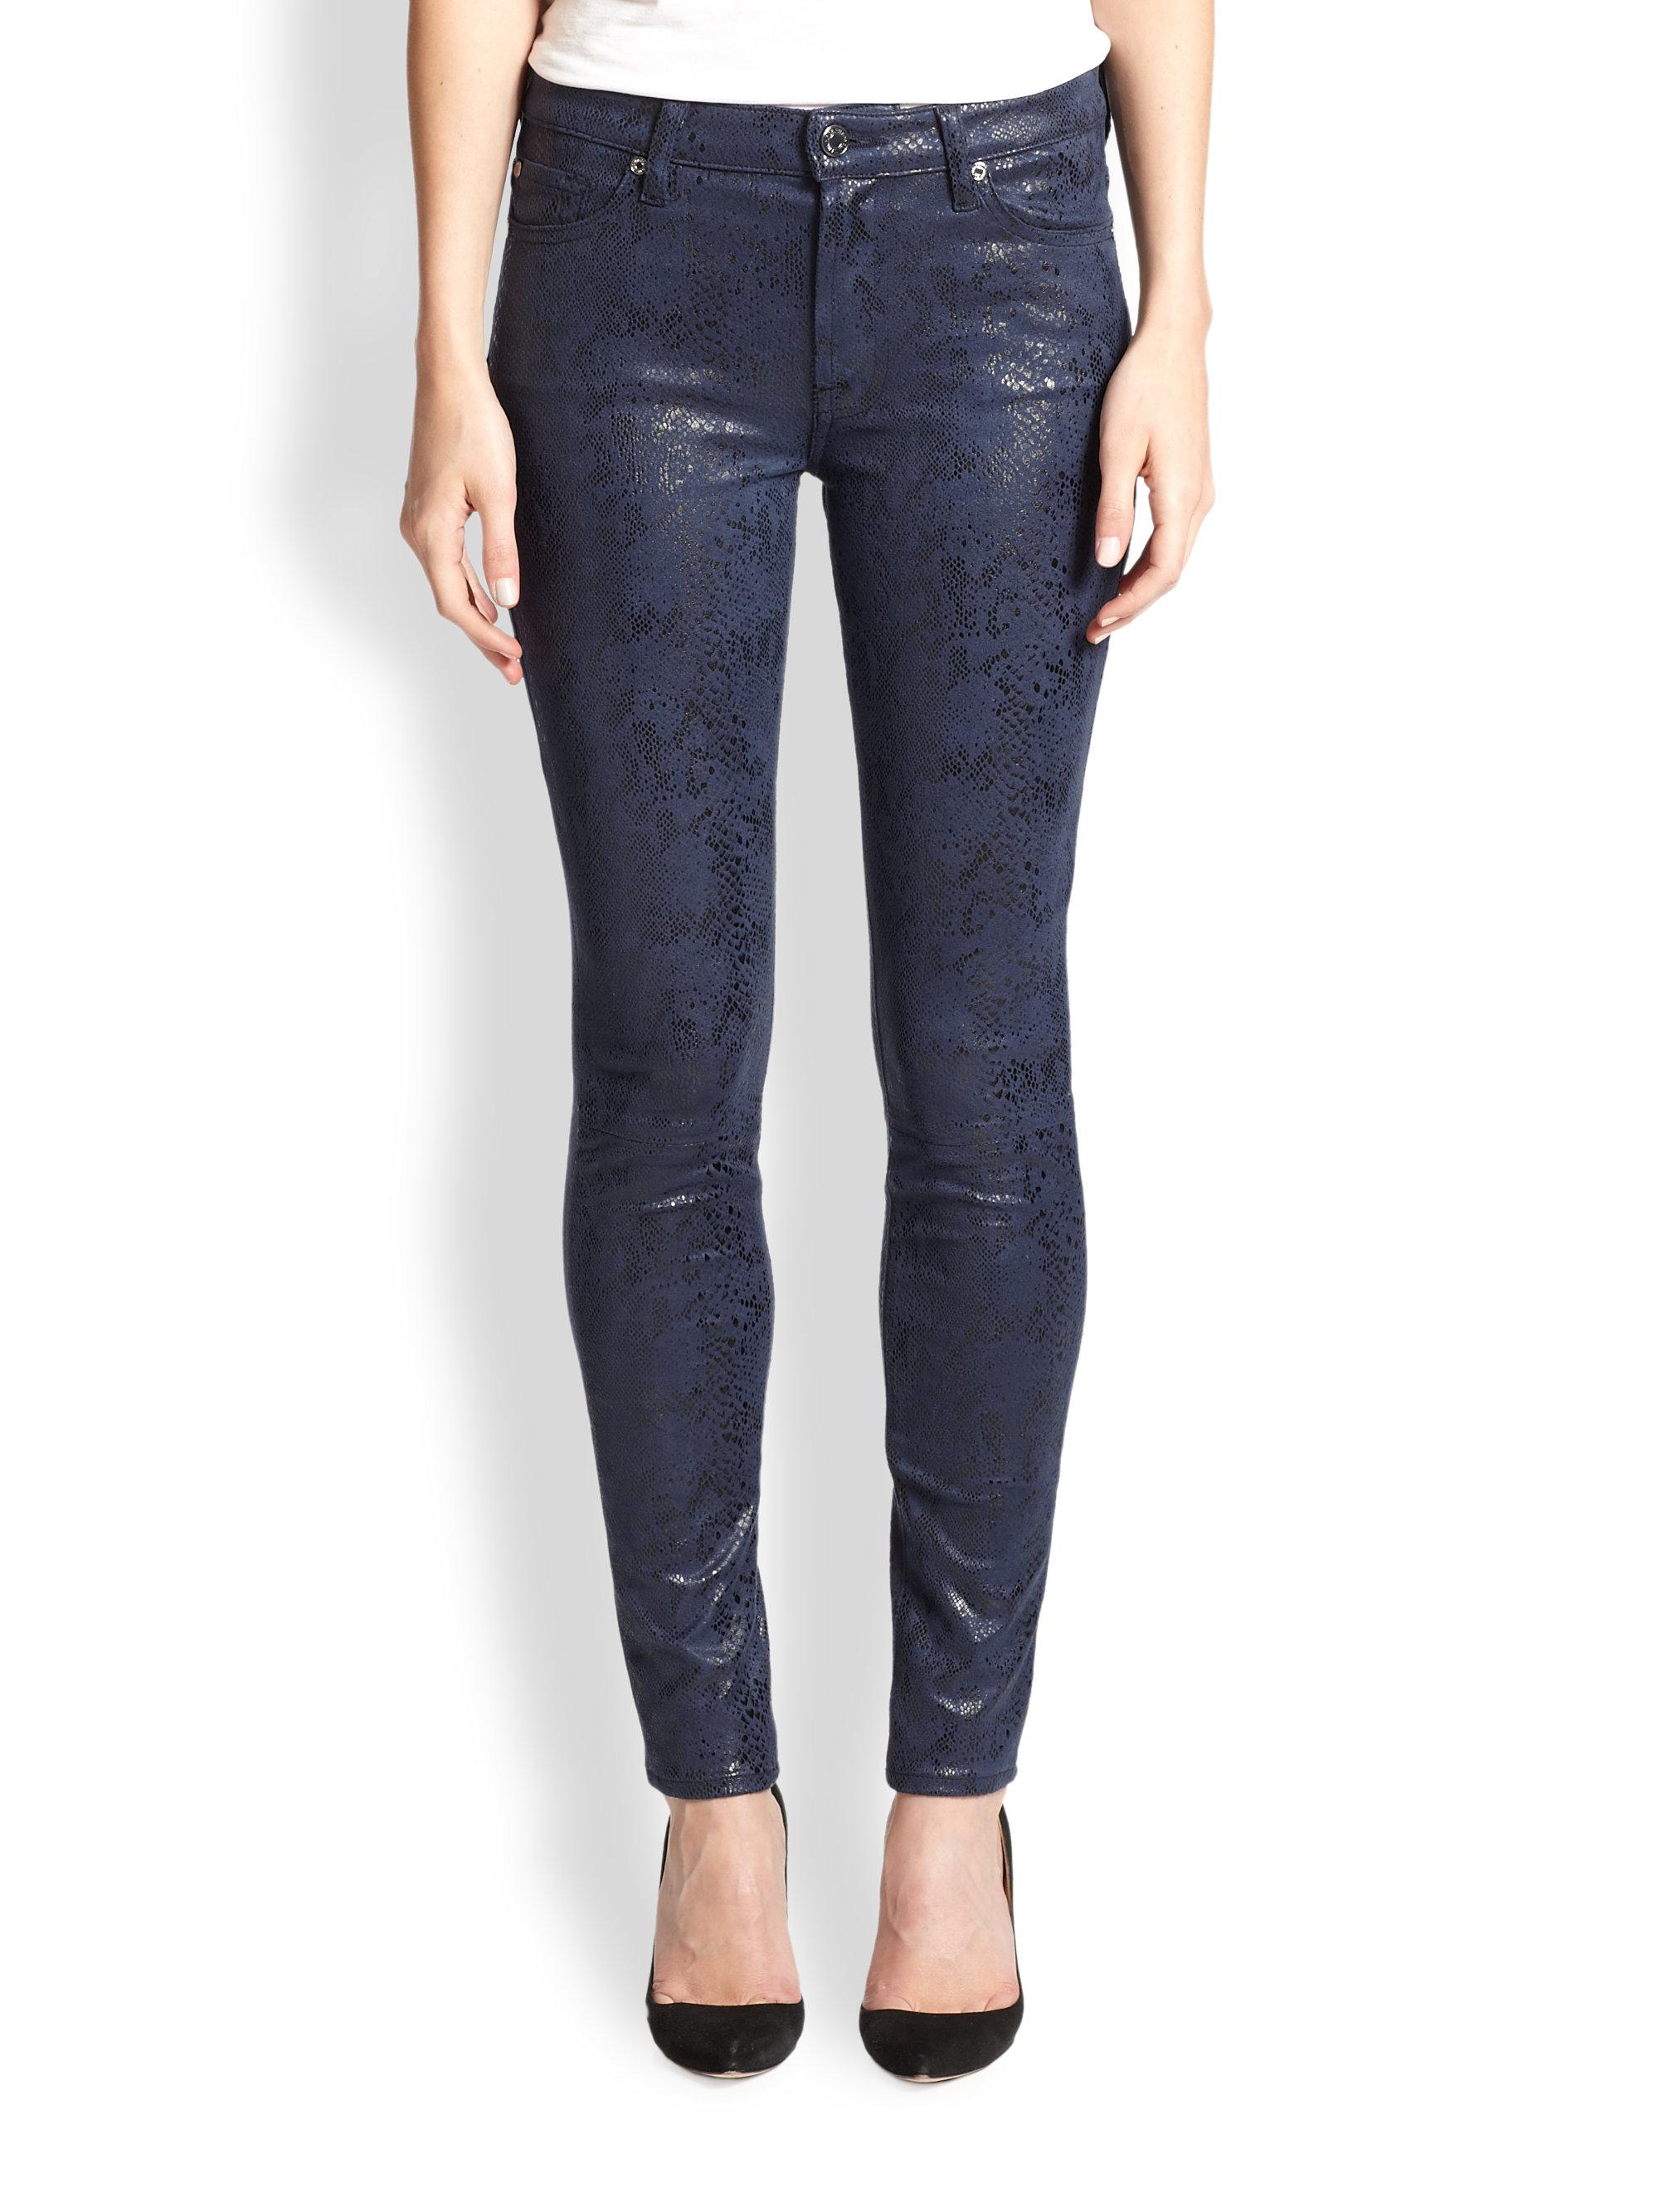 lyst 7 for all mankind coated snake print skinny jeans in blue. Black Bedroom Furniture Sets. Home Design Ideas